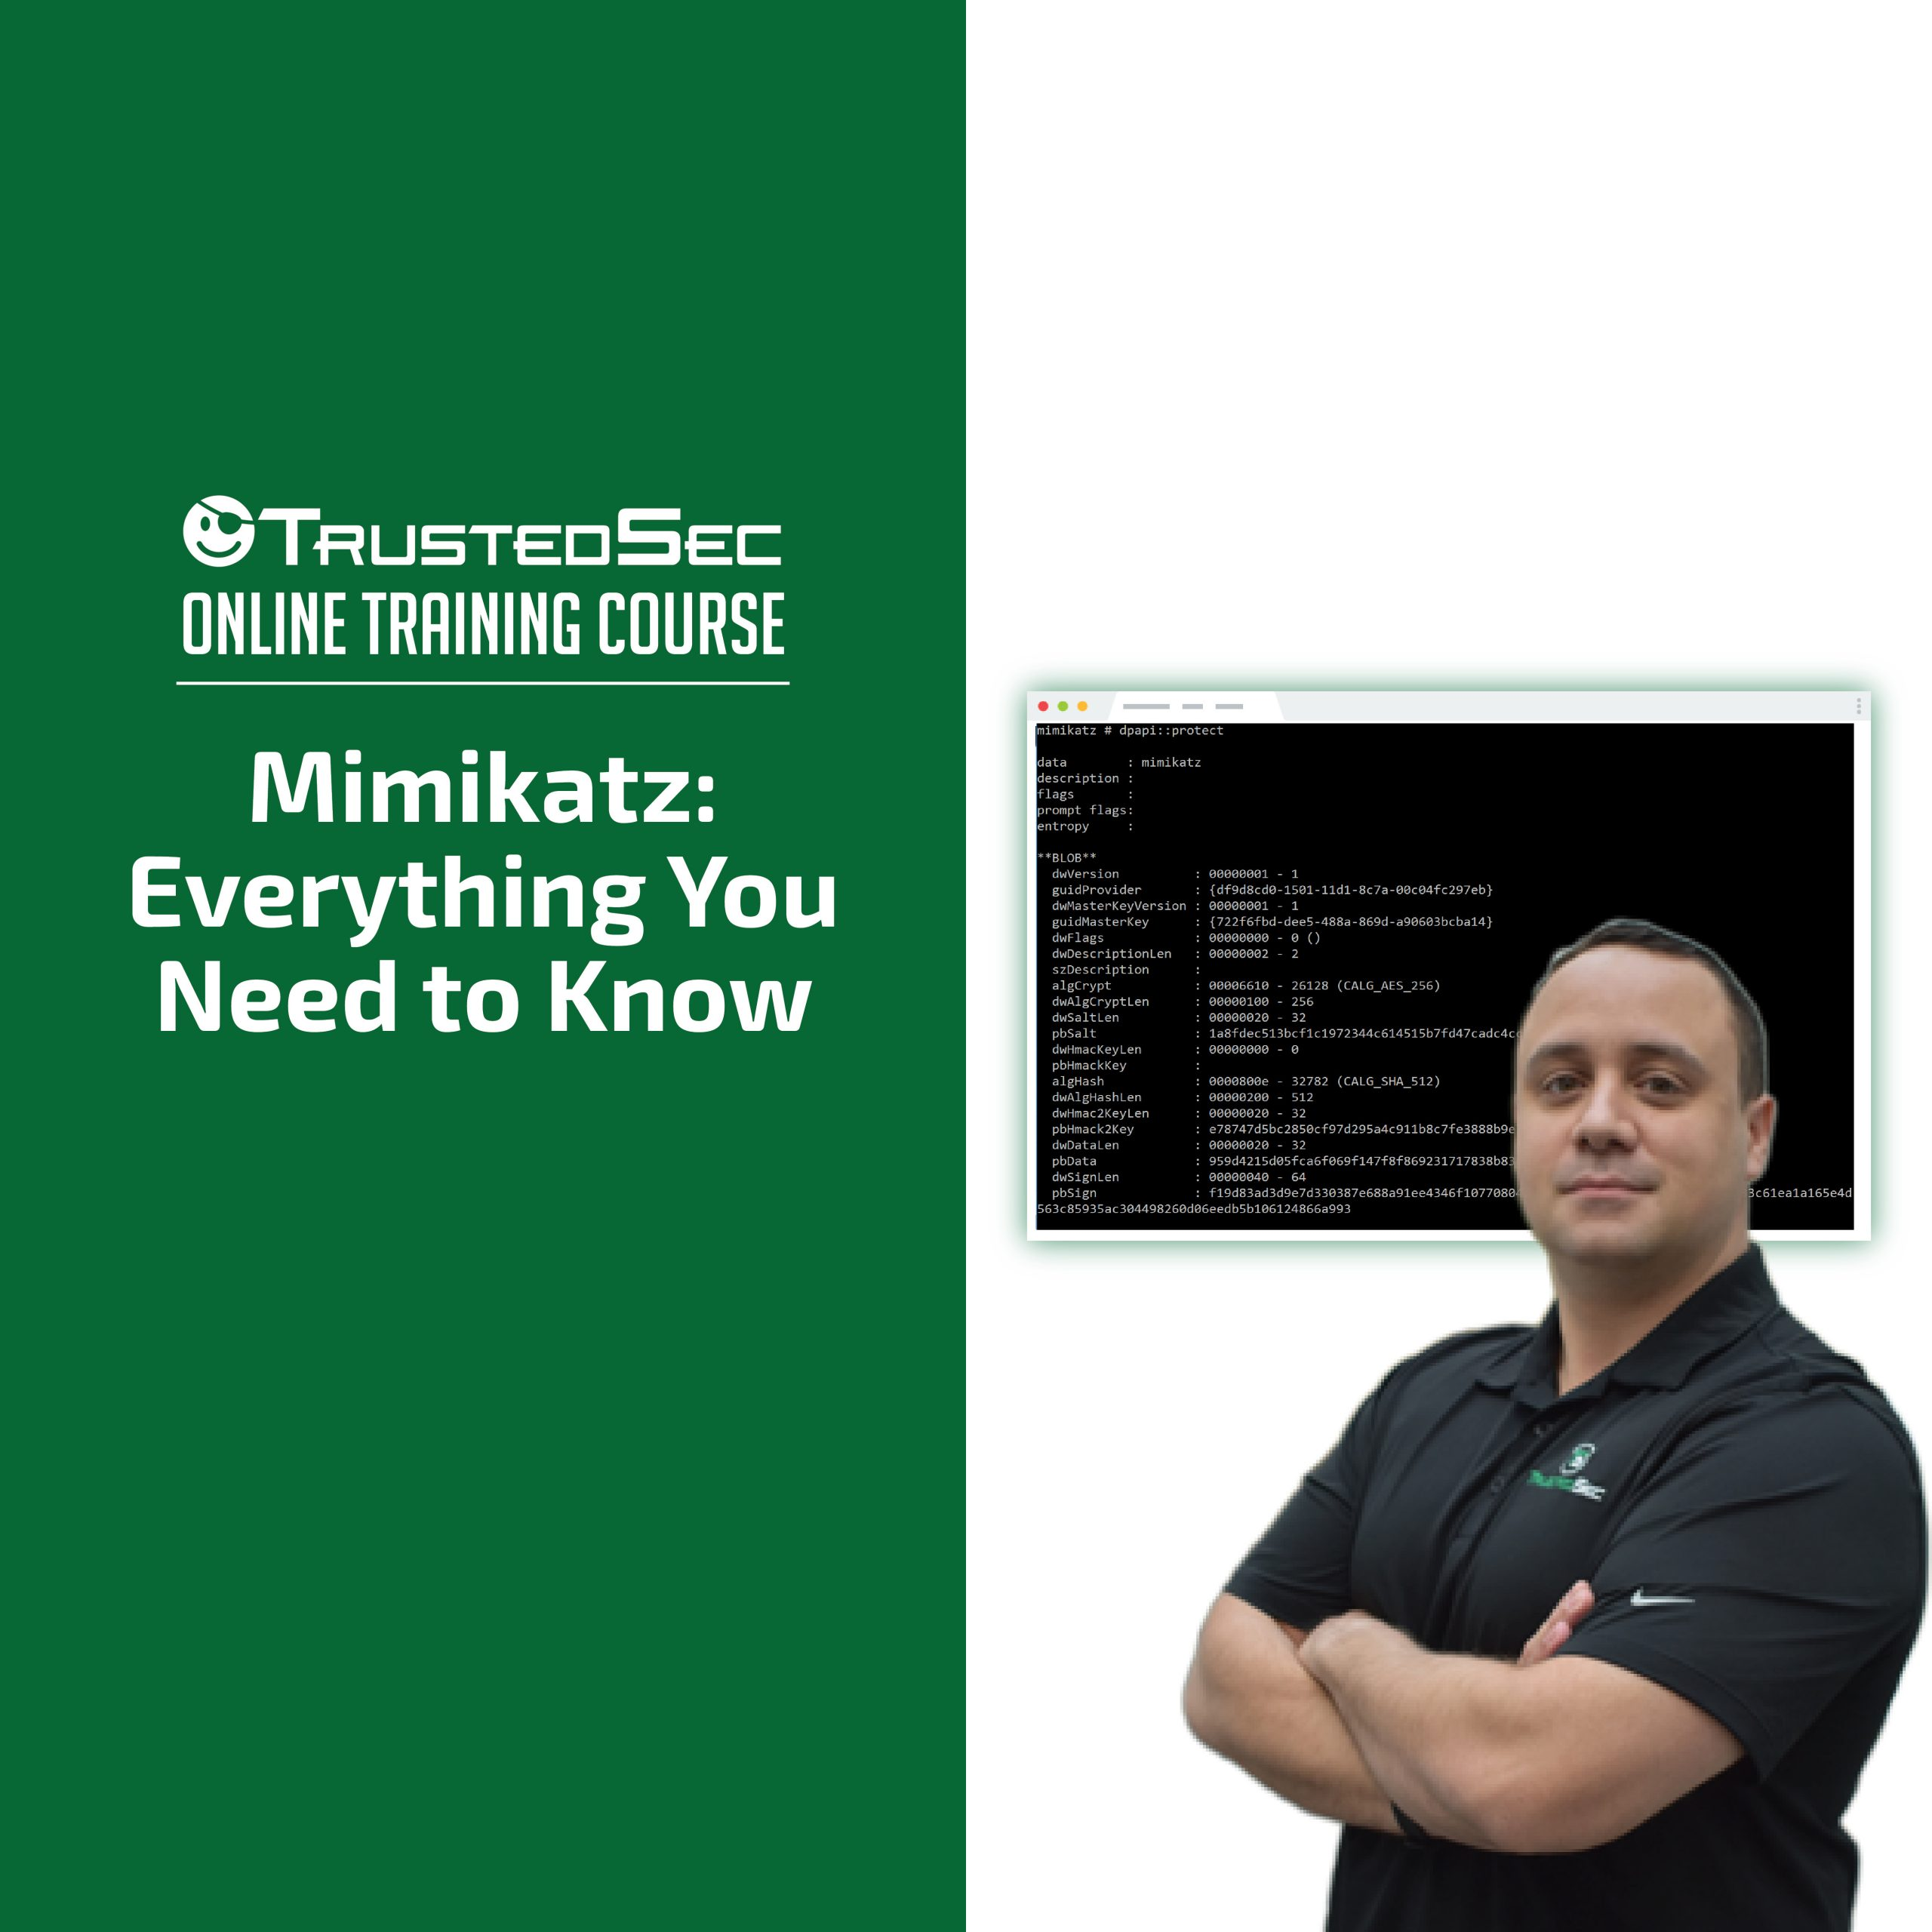 https://www.trustedsec.com/wp-content/uploads/2020/07/062520-Mikikatz-Training-Square-scaled.jpg